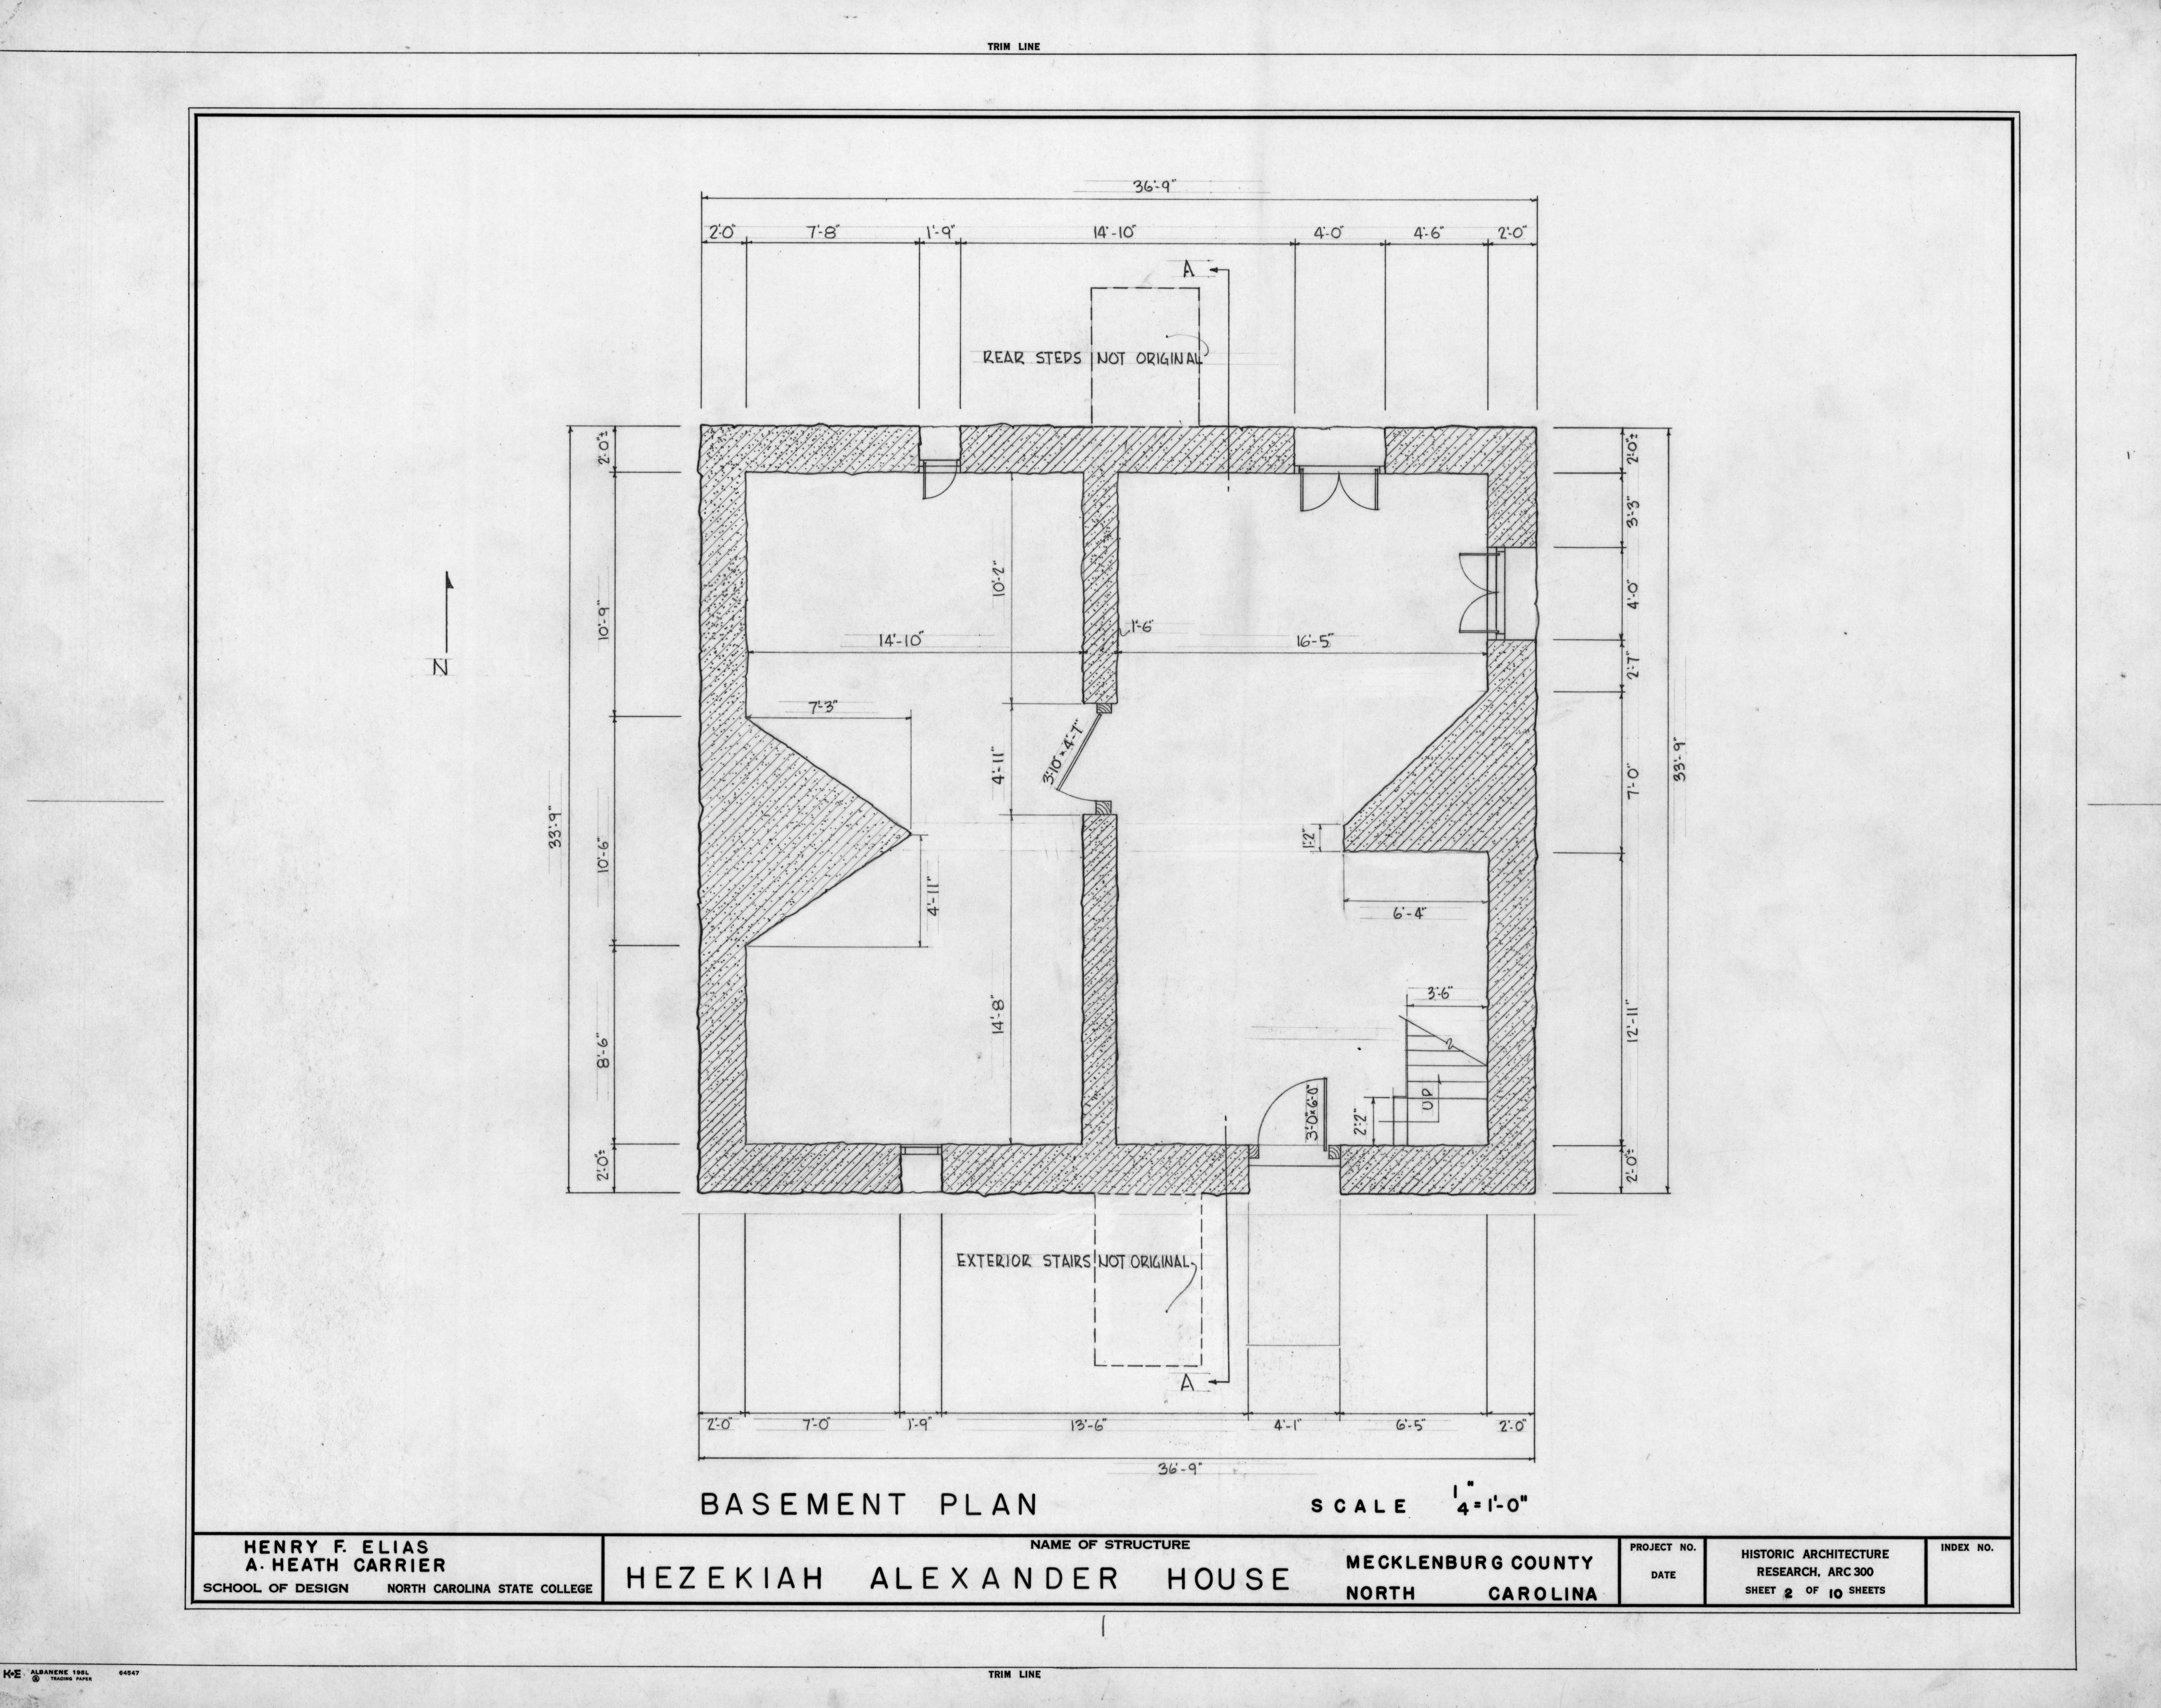 Basement Plan Hezekiah Alexander House Mecklenburg